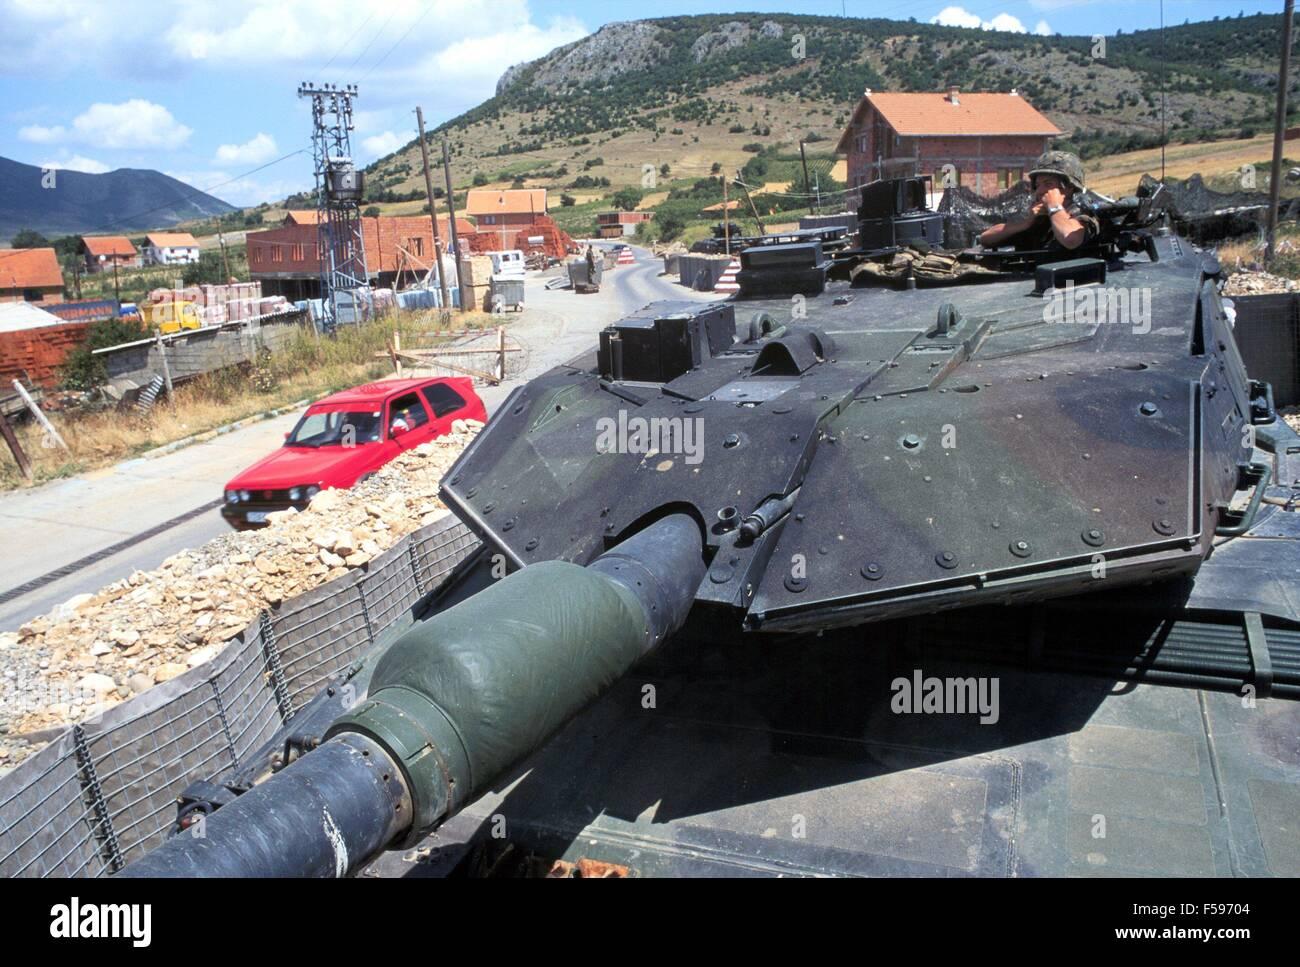 Humanitarian intervention: NATO intervention in KOSOVO - Essay Example